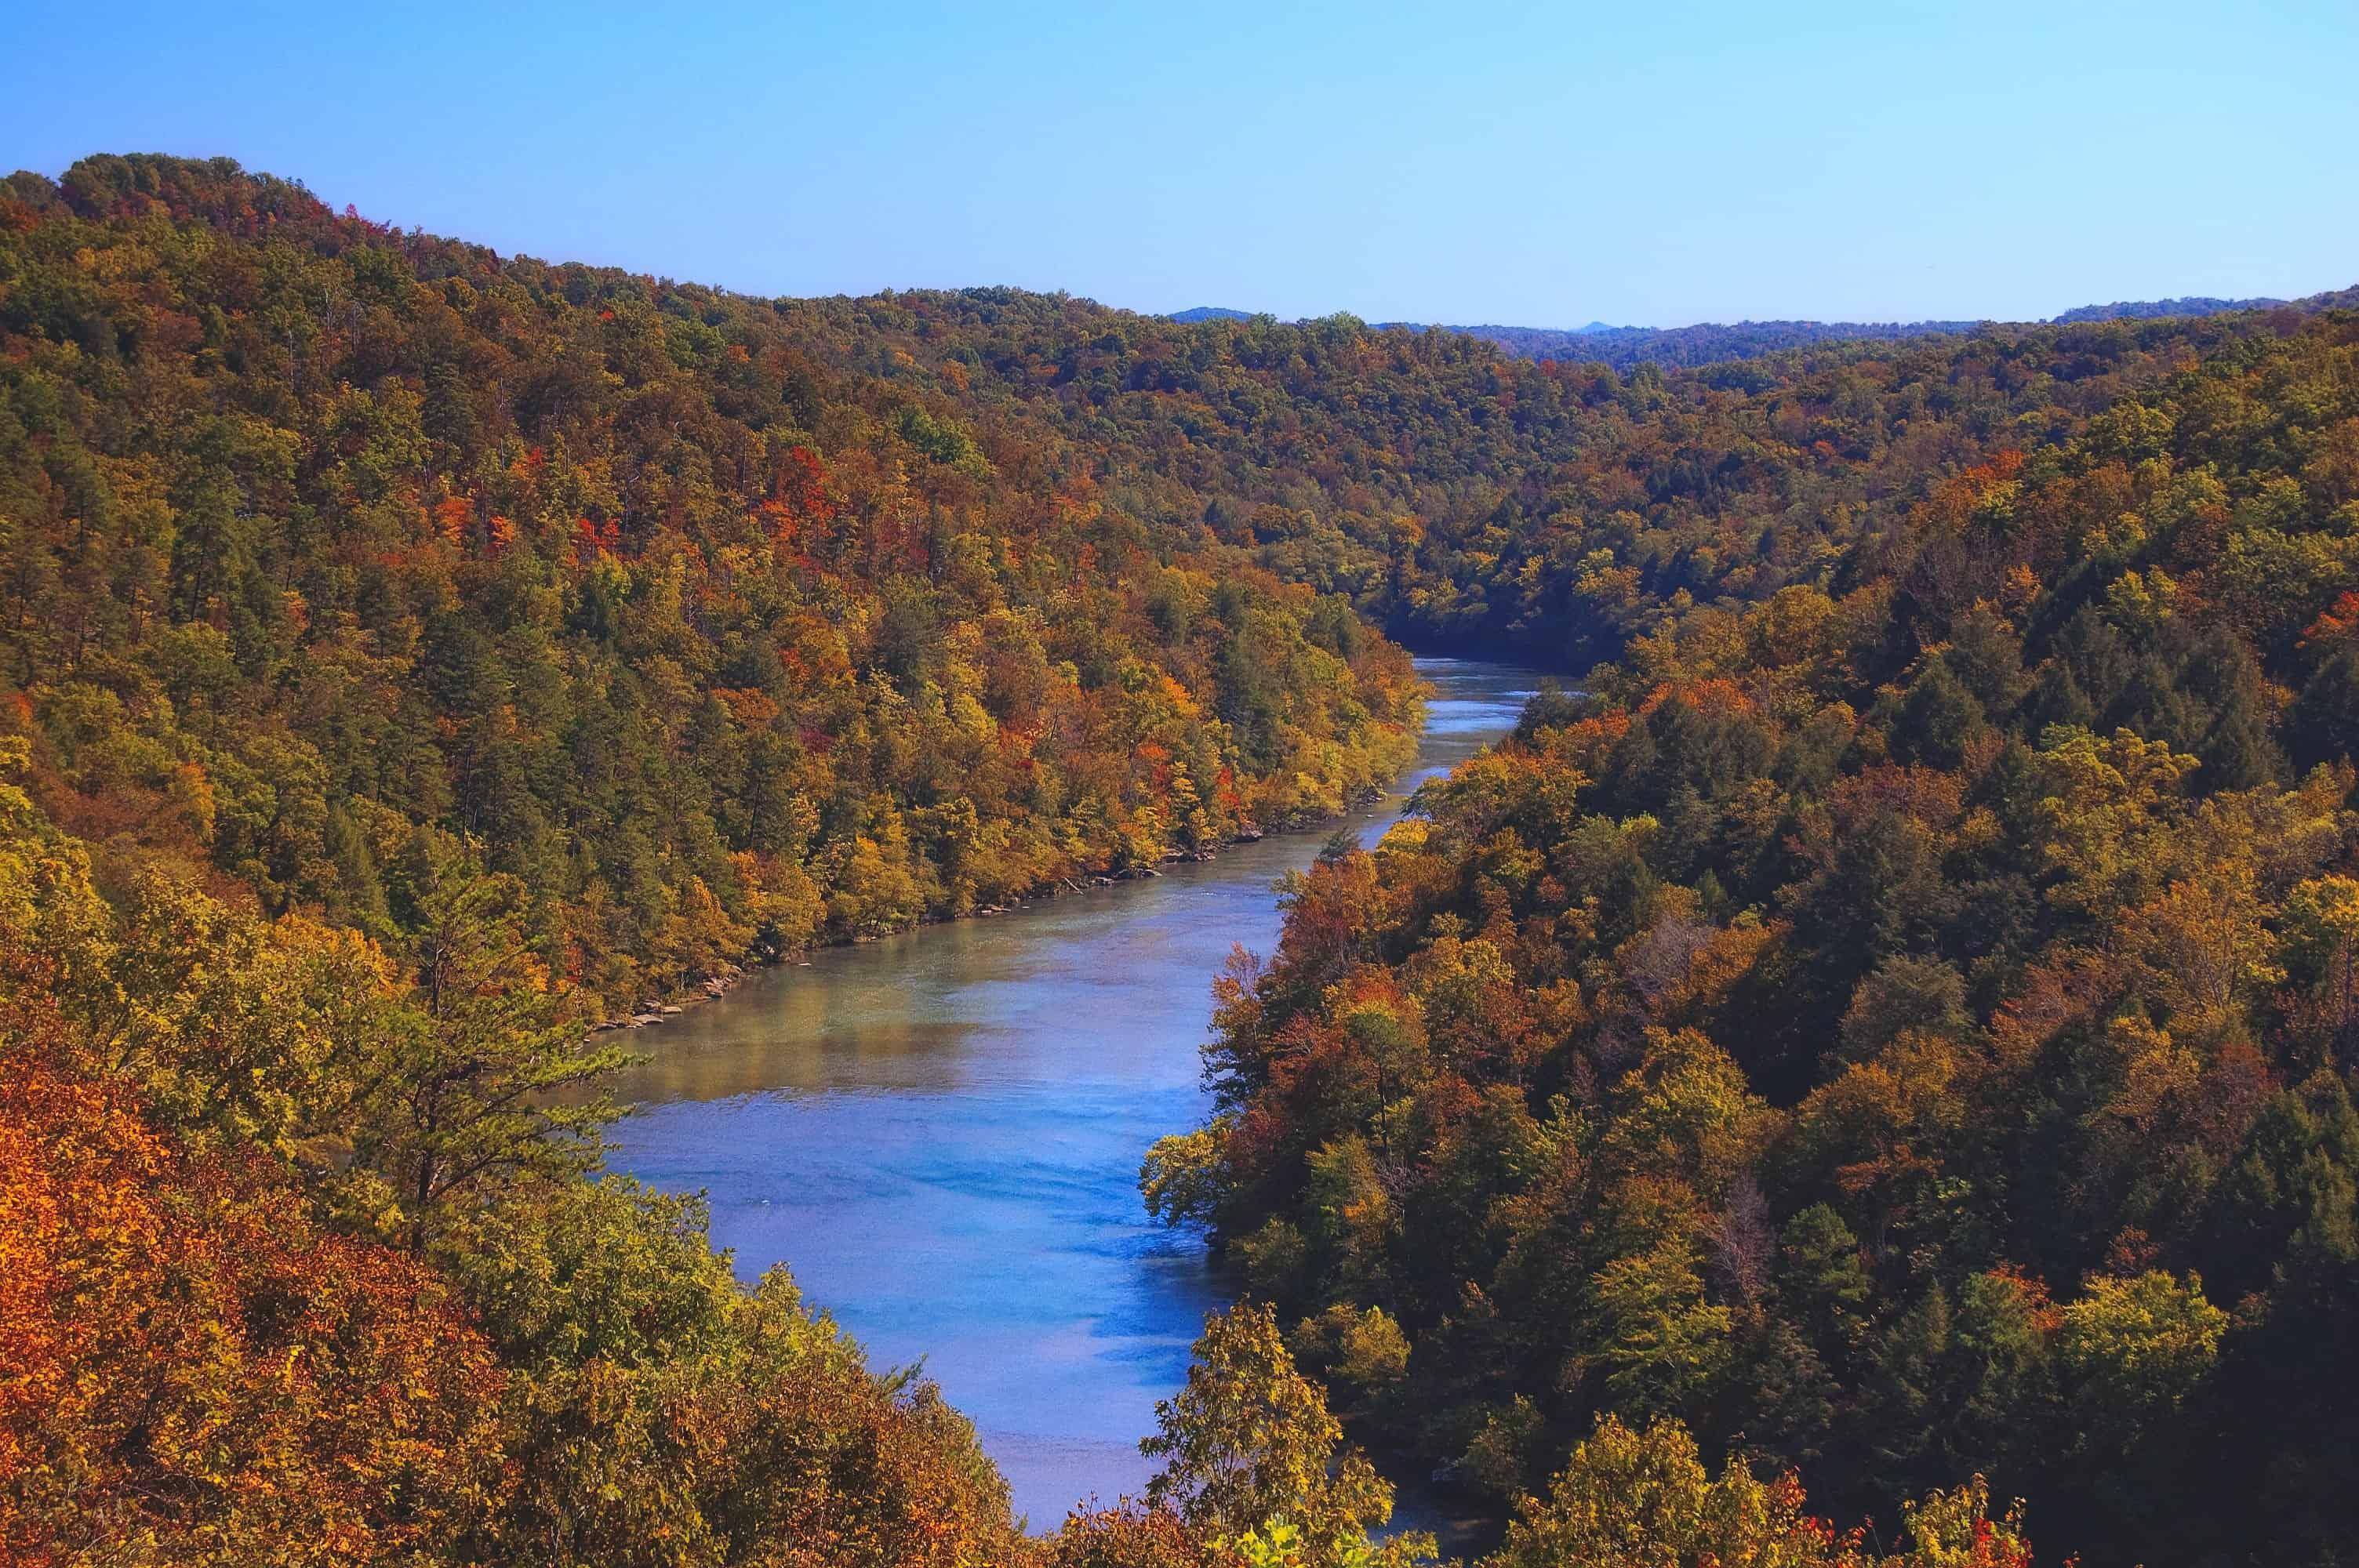 Cumberland river, kentucky facts